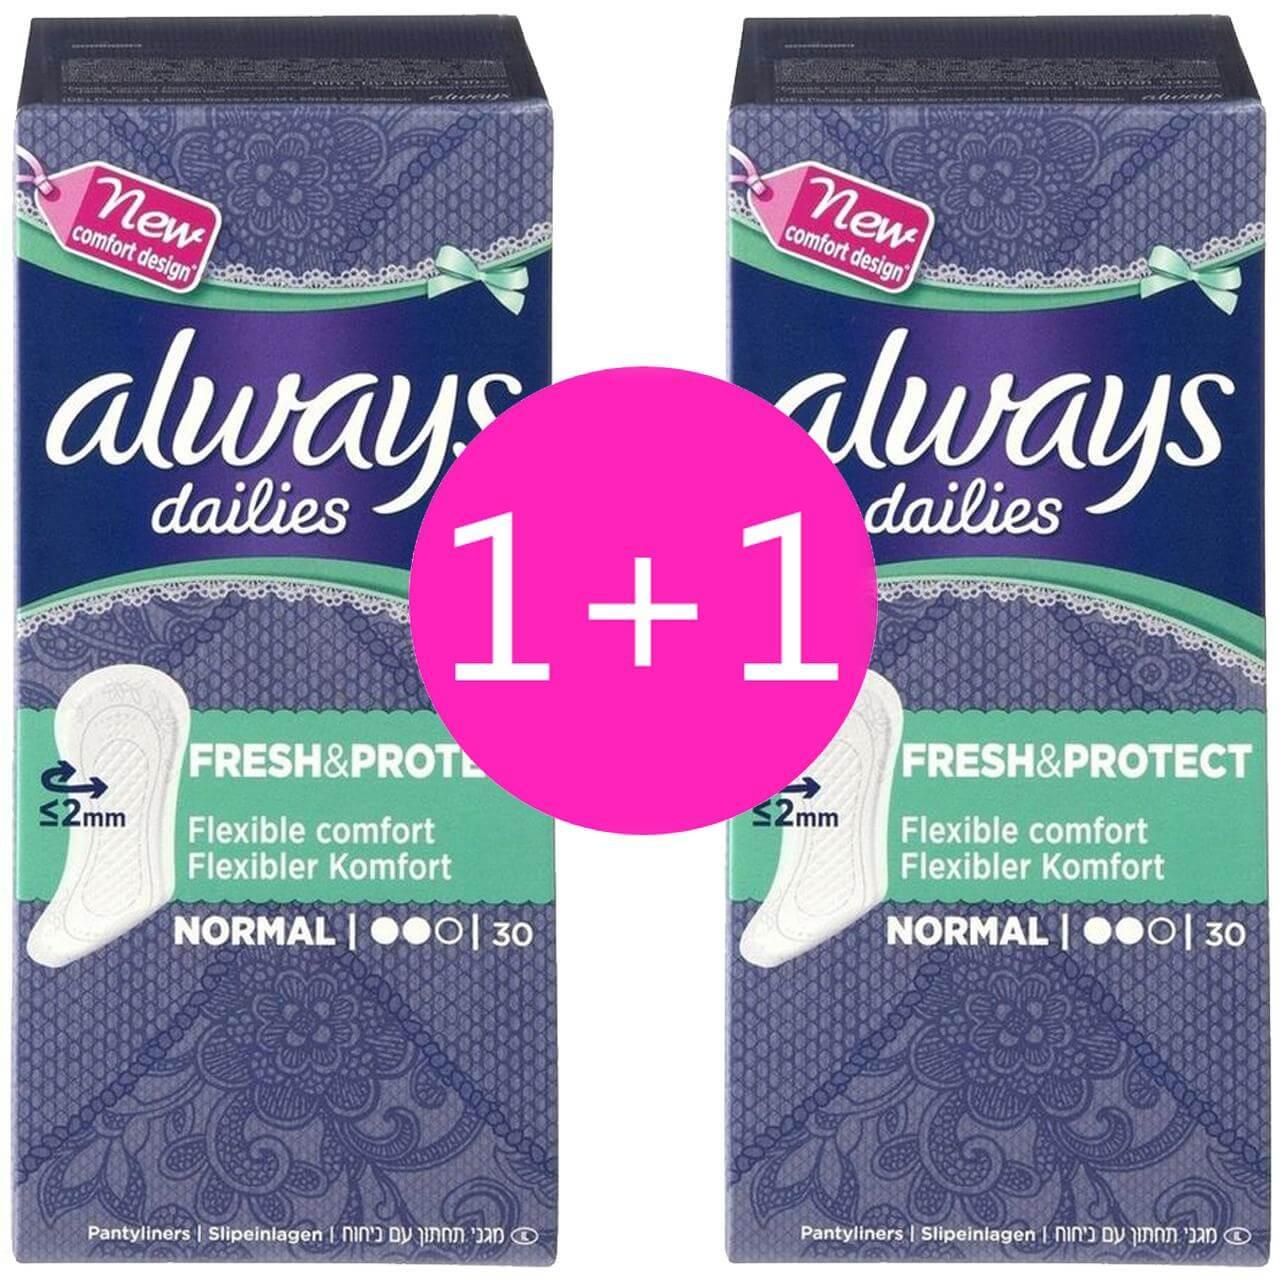 Always Πακέτο Προσφοράς Dailies Fresh & Protect Normal Σερβιετάκια με Άνετη Εφαρμογή Όλη Μέρα 2×30 Τεμάχια 1+1 Δώρο